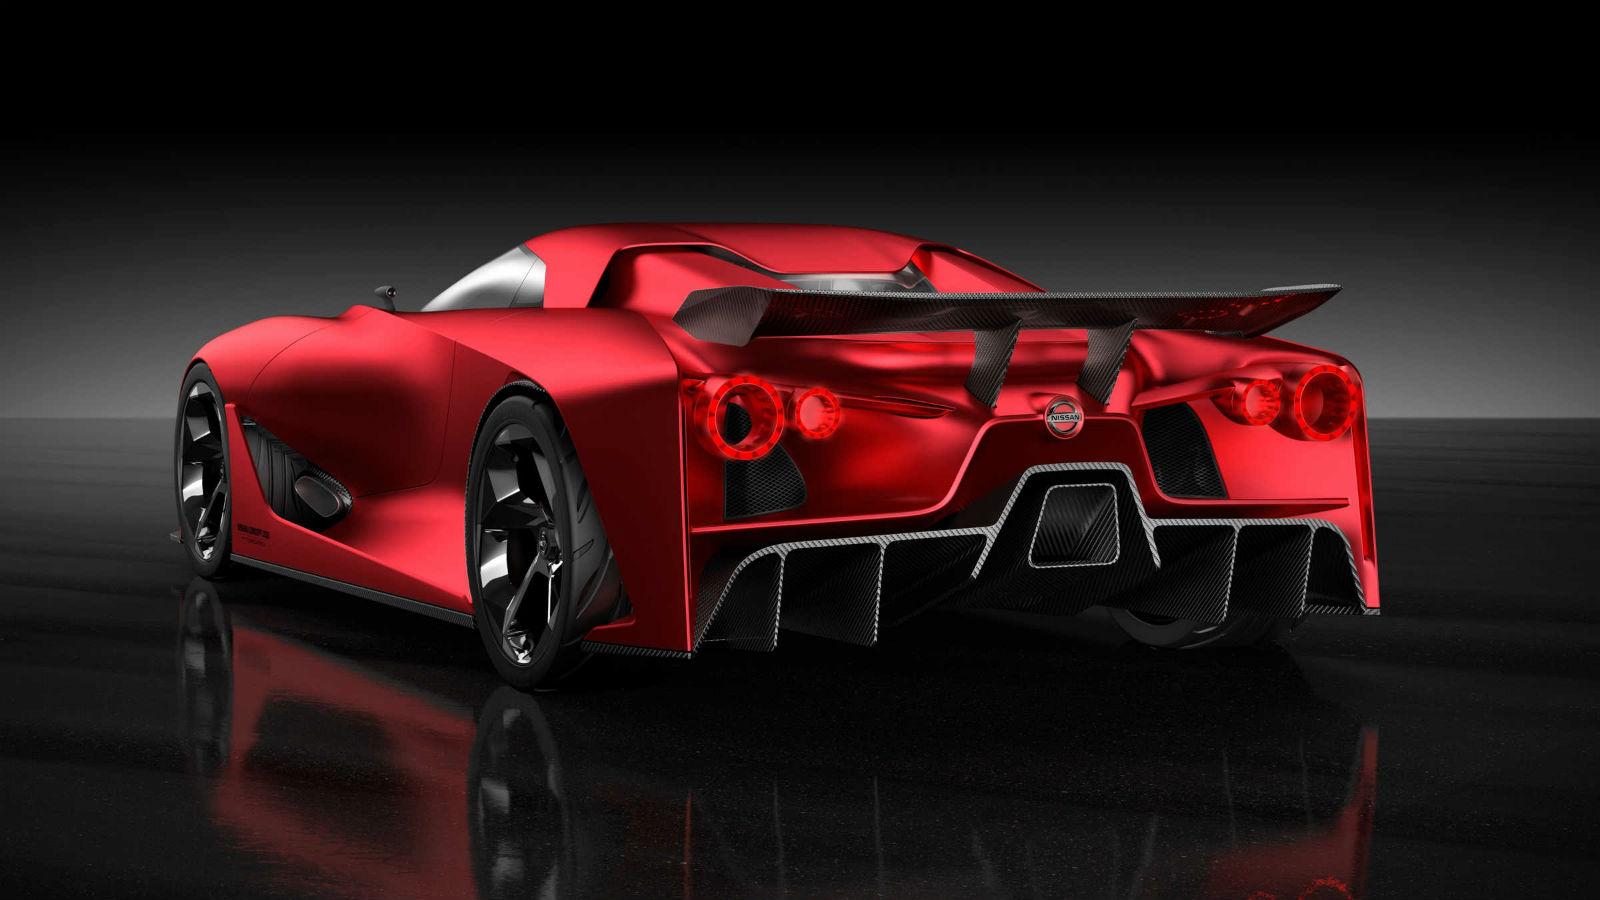 Nissan-Concept-2020-Vision-Gran-Turismo-rear-three-quarters-view.jpg